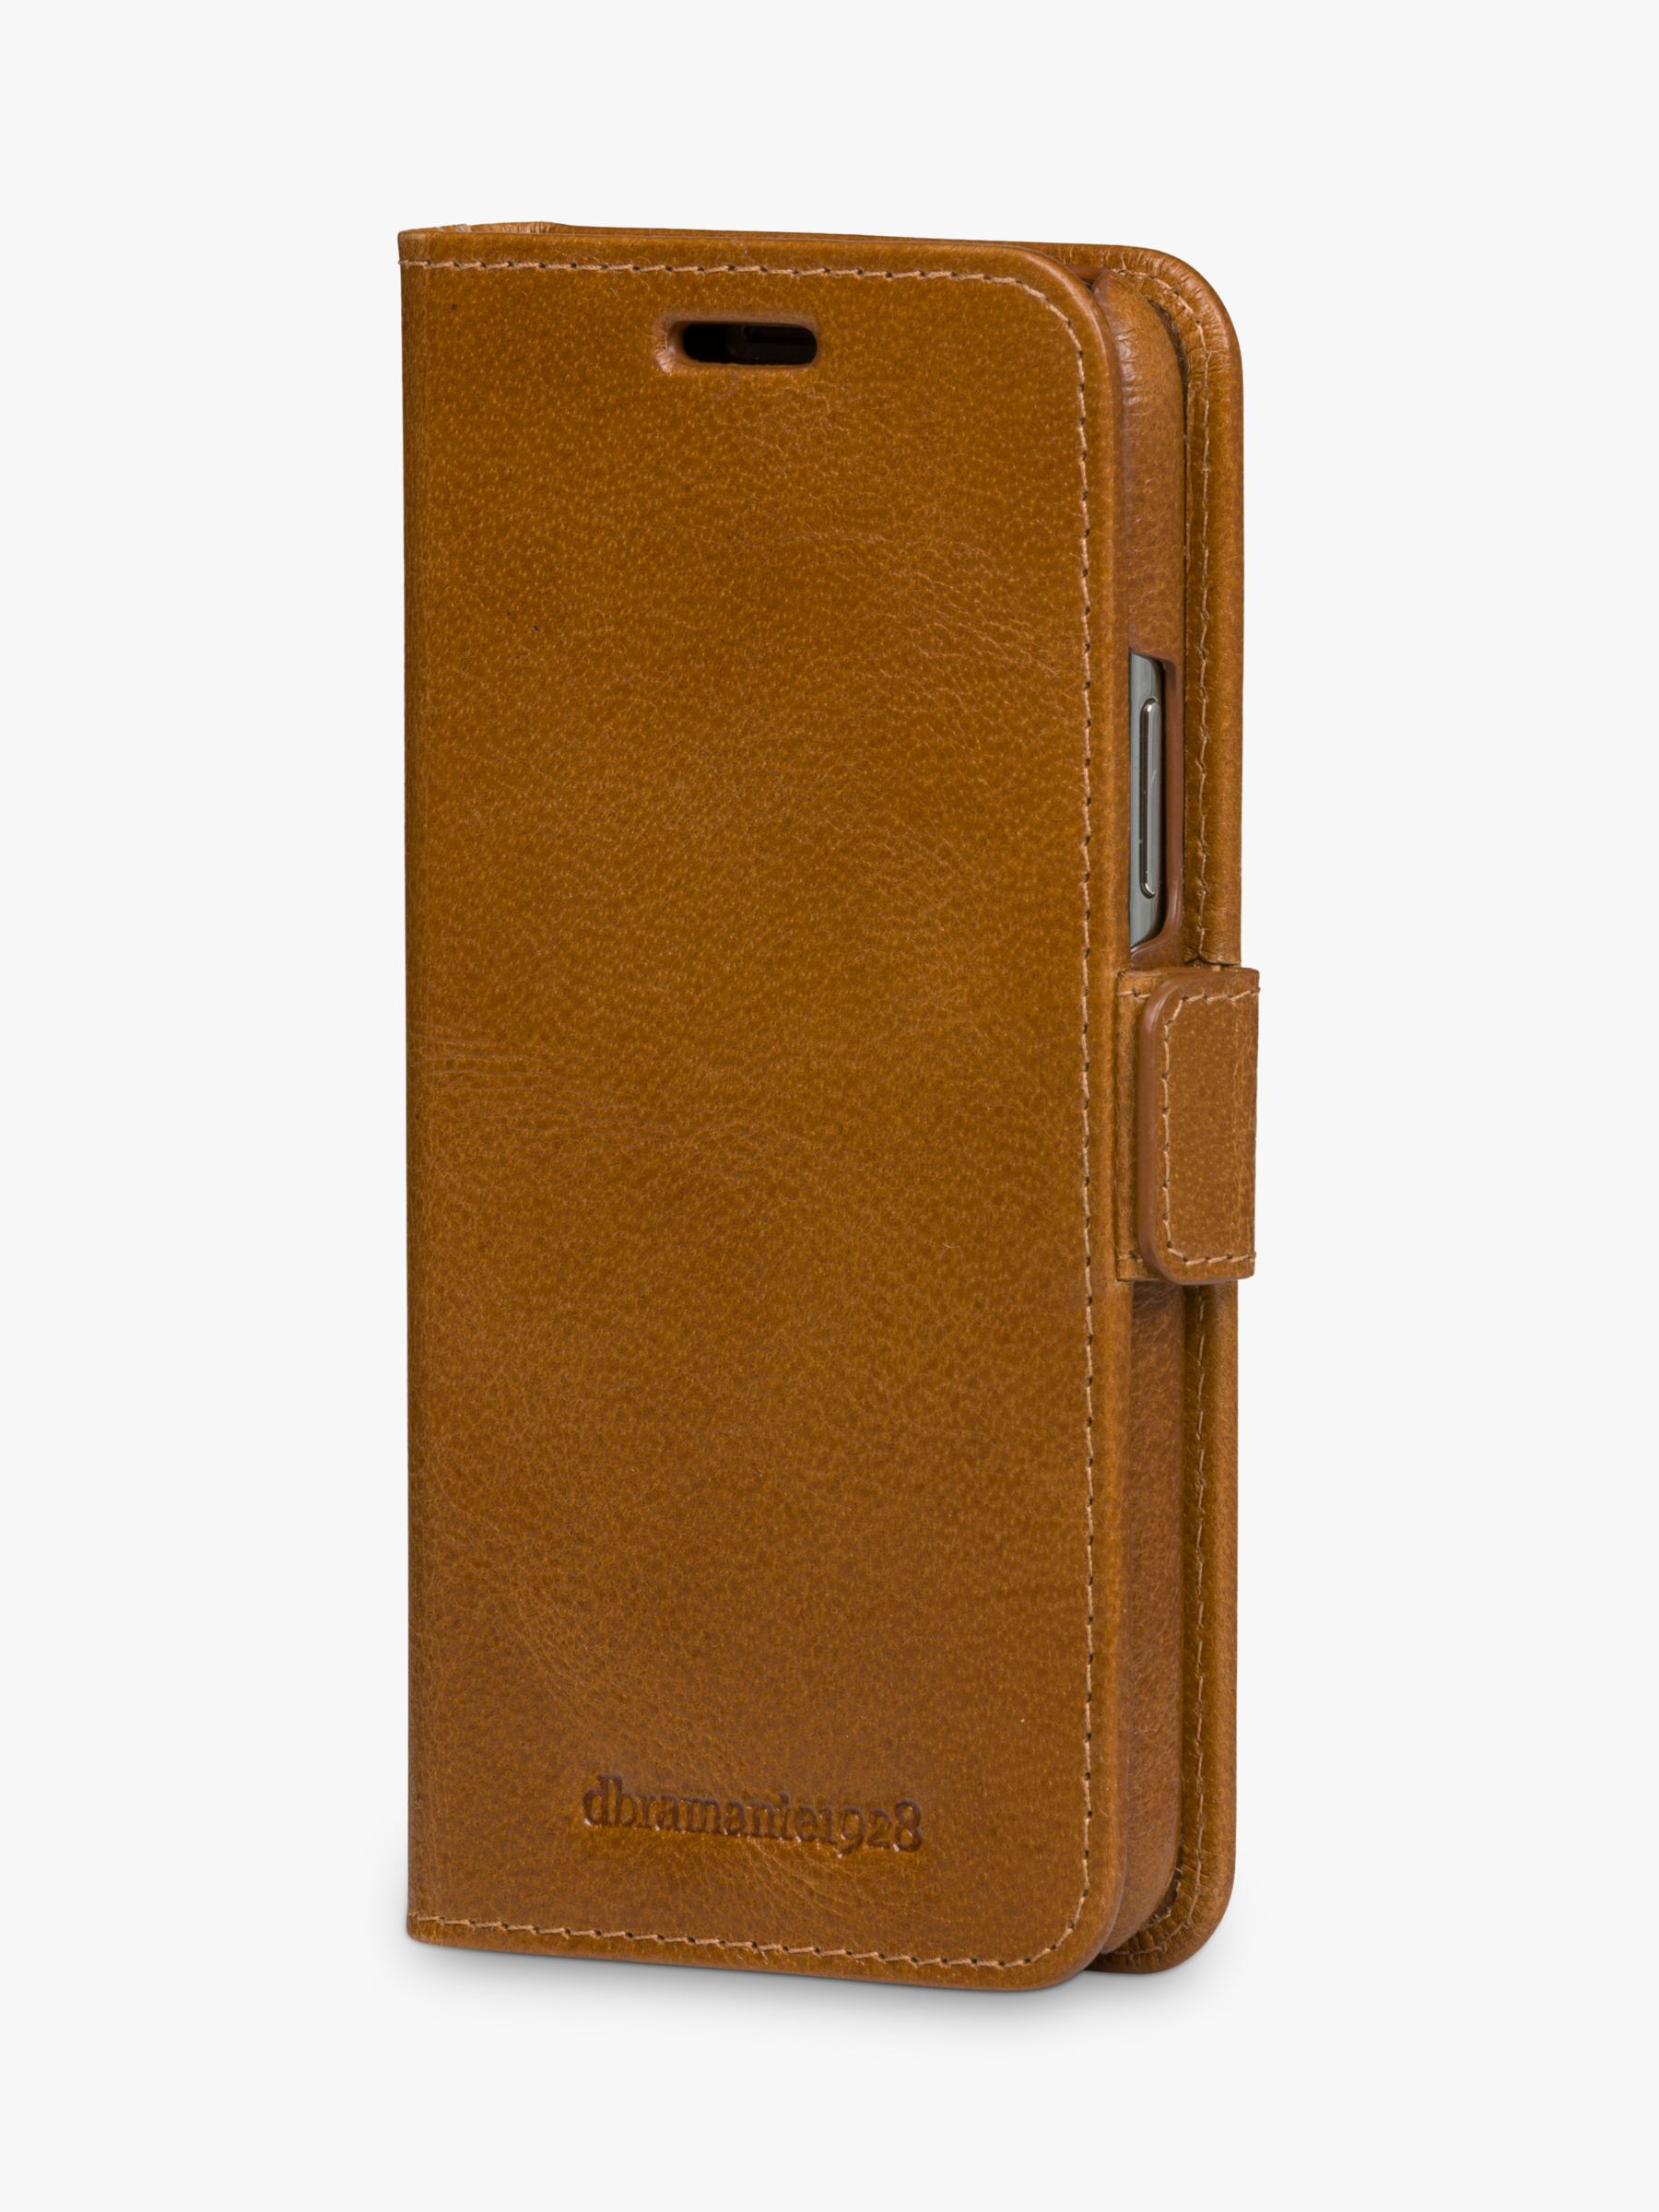 dbramante1928 MODE New York Leather dbramante1928 Folio/Cradle Case for iPhone 11 Pro, Tan